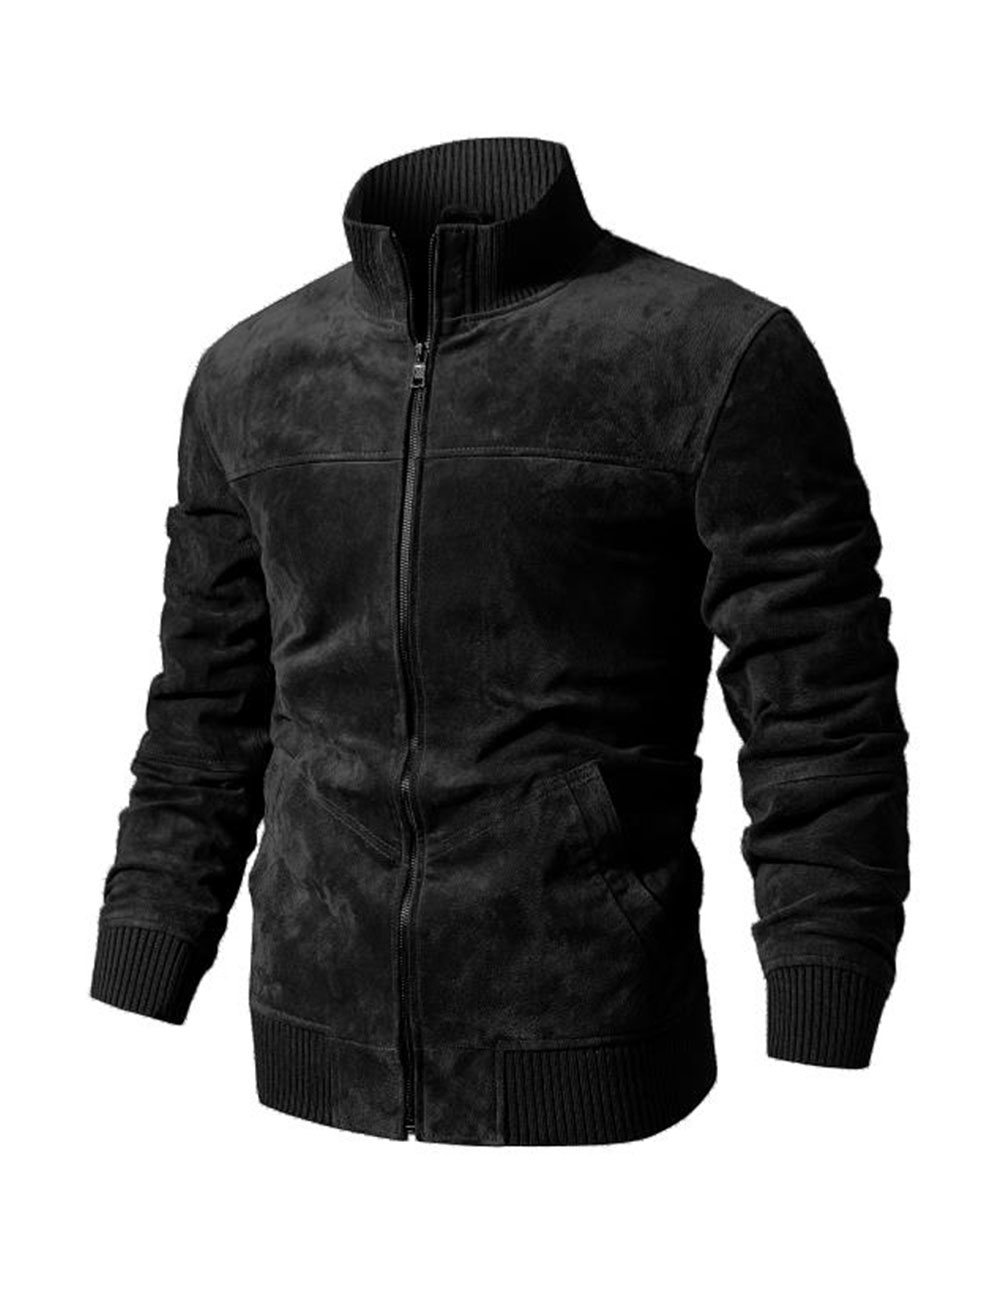 HTB1GHKBlpkoBKNjSZFkq6z4tFXaH FLAVOR Men's Real Leather Jacket Men Pigskin Slim Fit Genuine Leather Coat With Rib Cuff Standing Collar